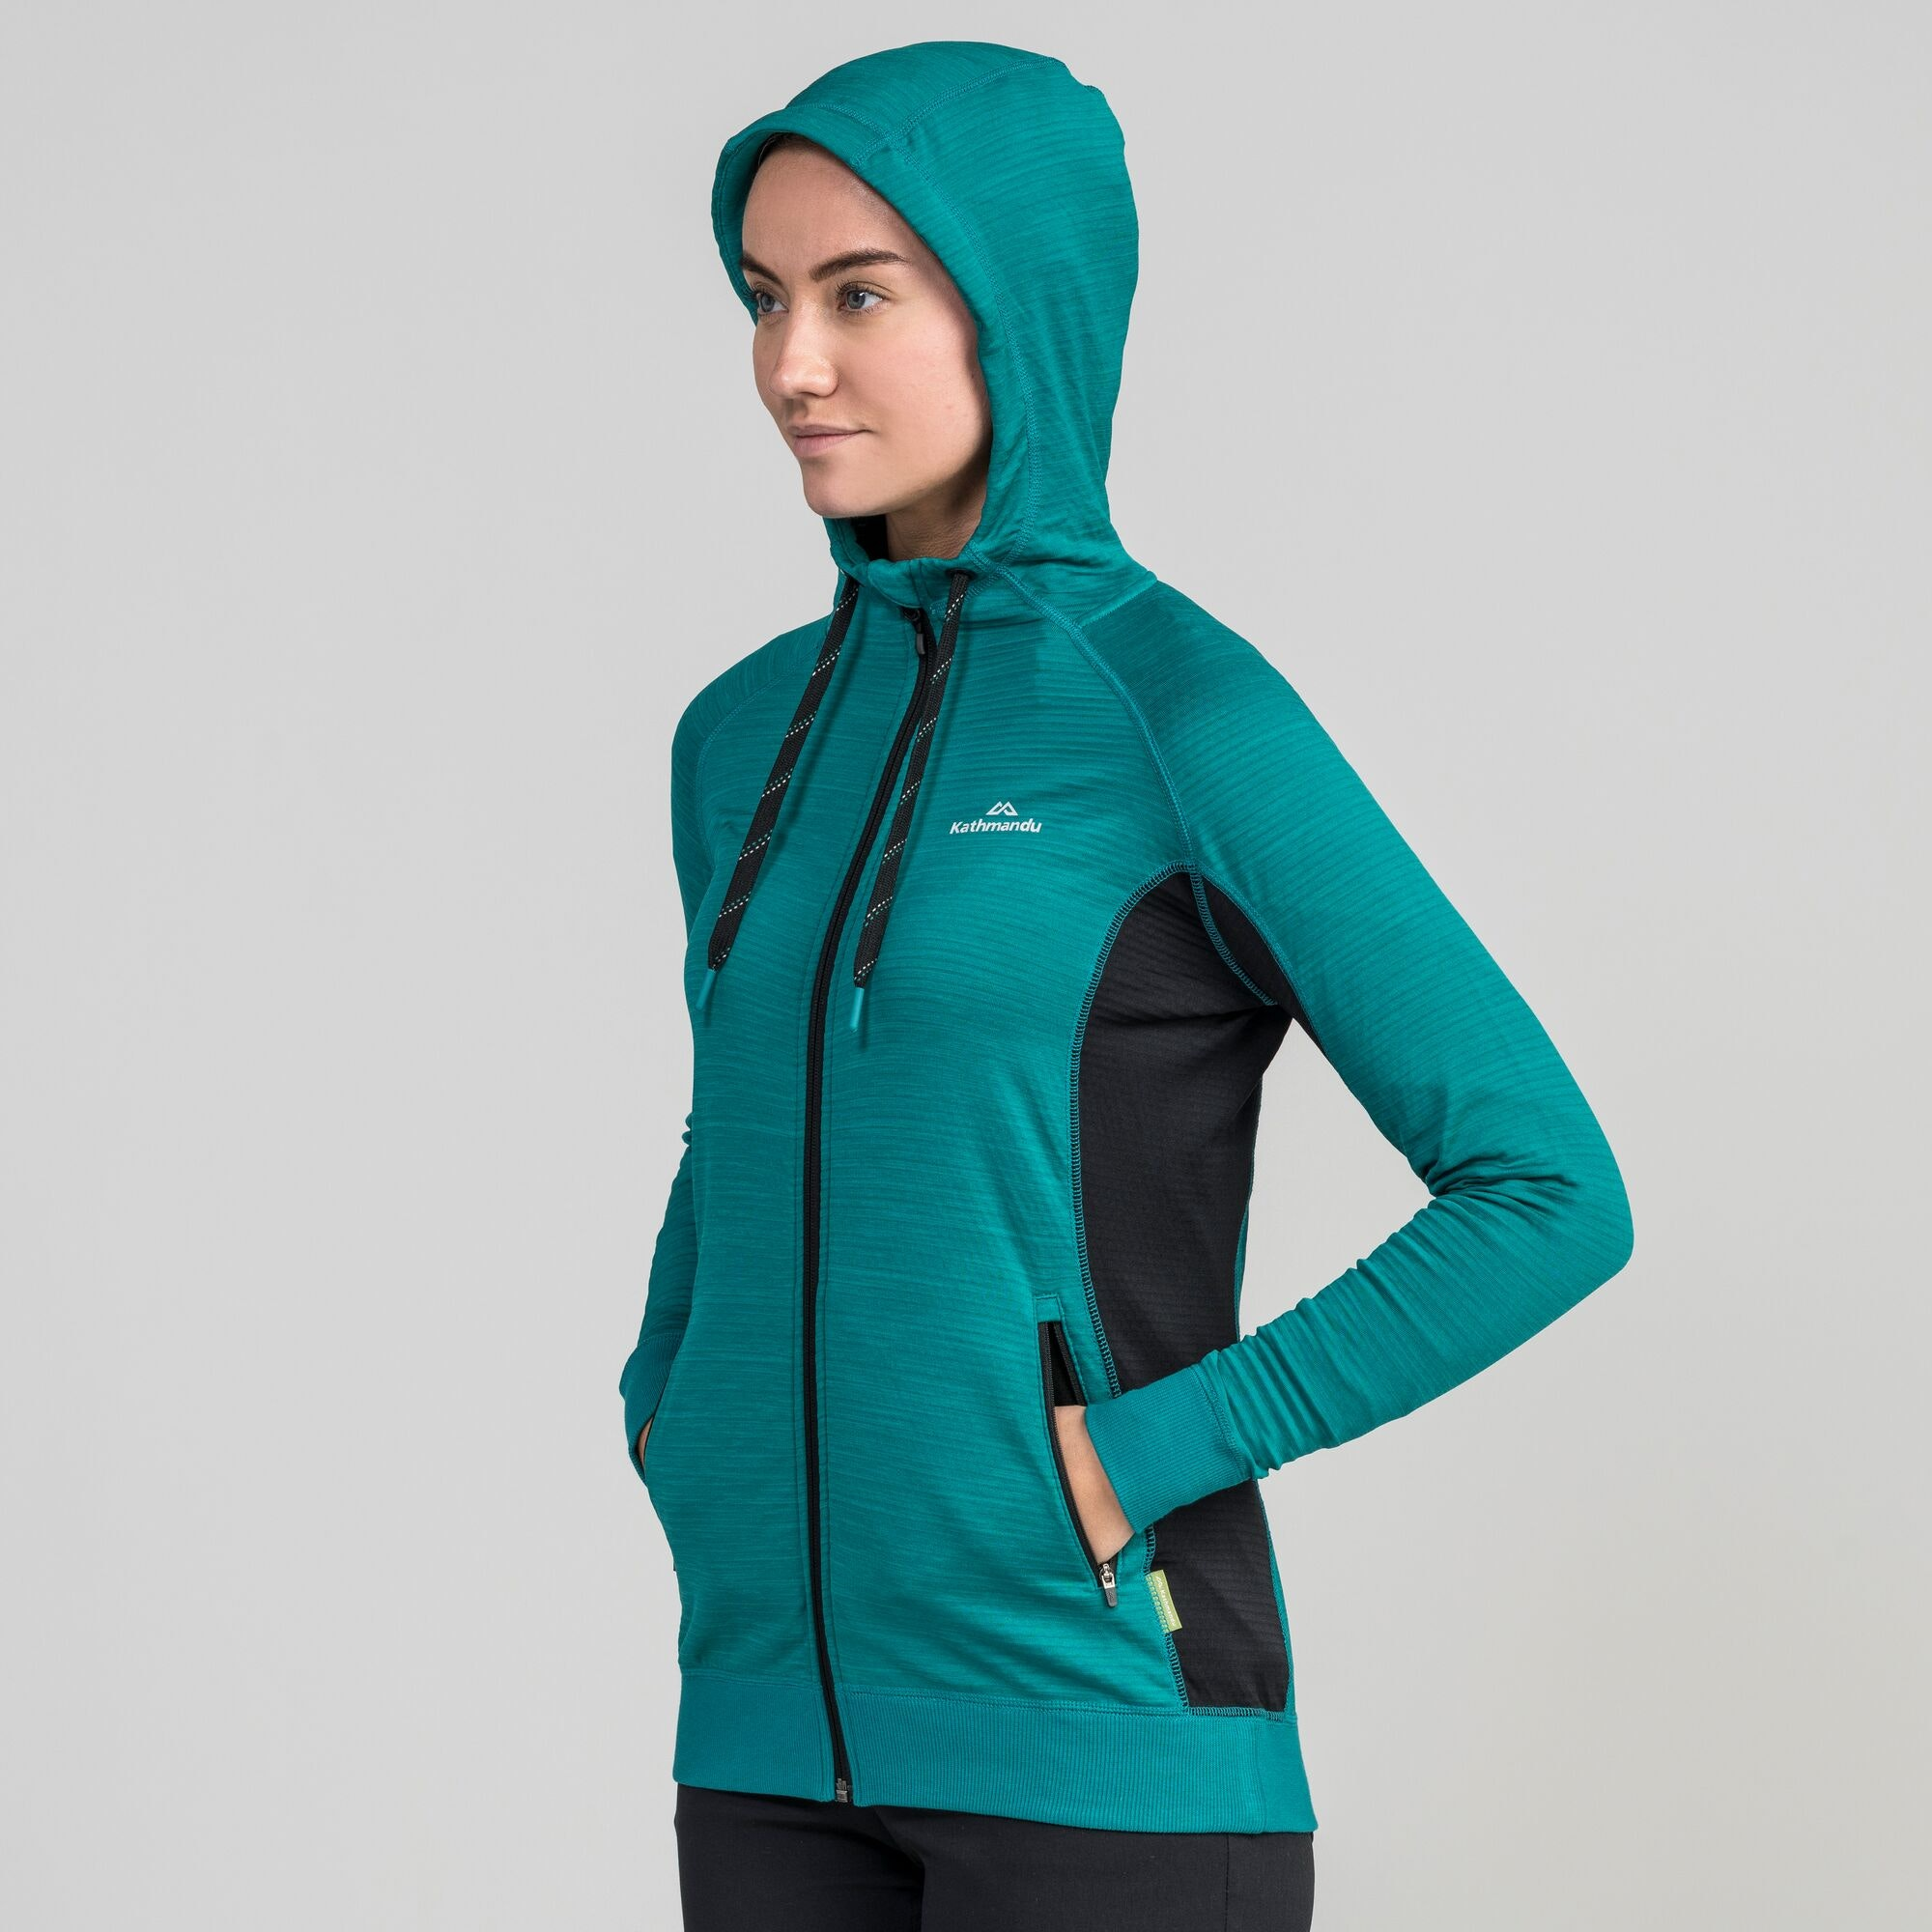 NEW-Kathmandu-Acota-Women-s-Hooded-Fleece-Lightweight-Breathable-Outdoor-Jacket thumbnail 16